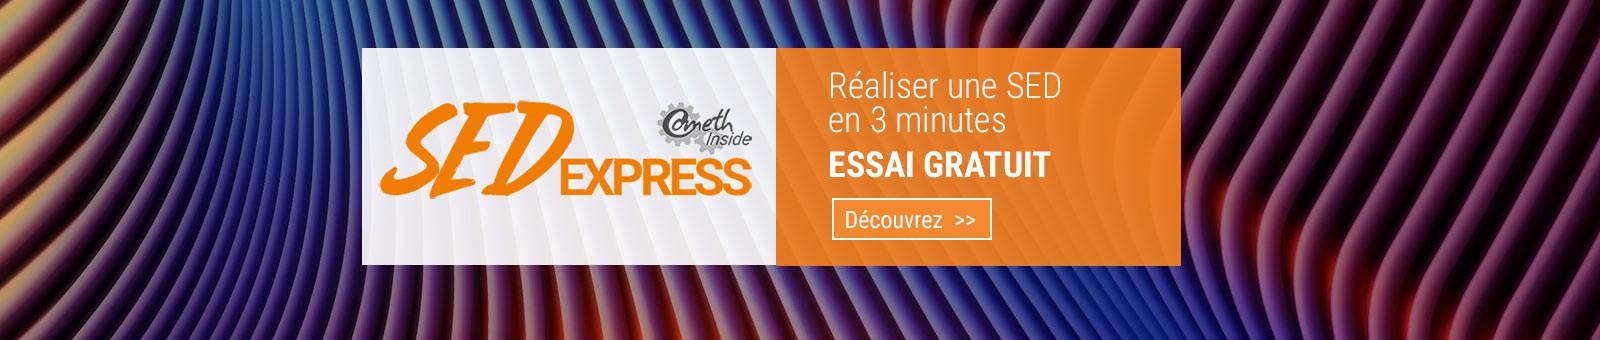 Essai gratuit SEDexpress